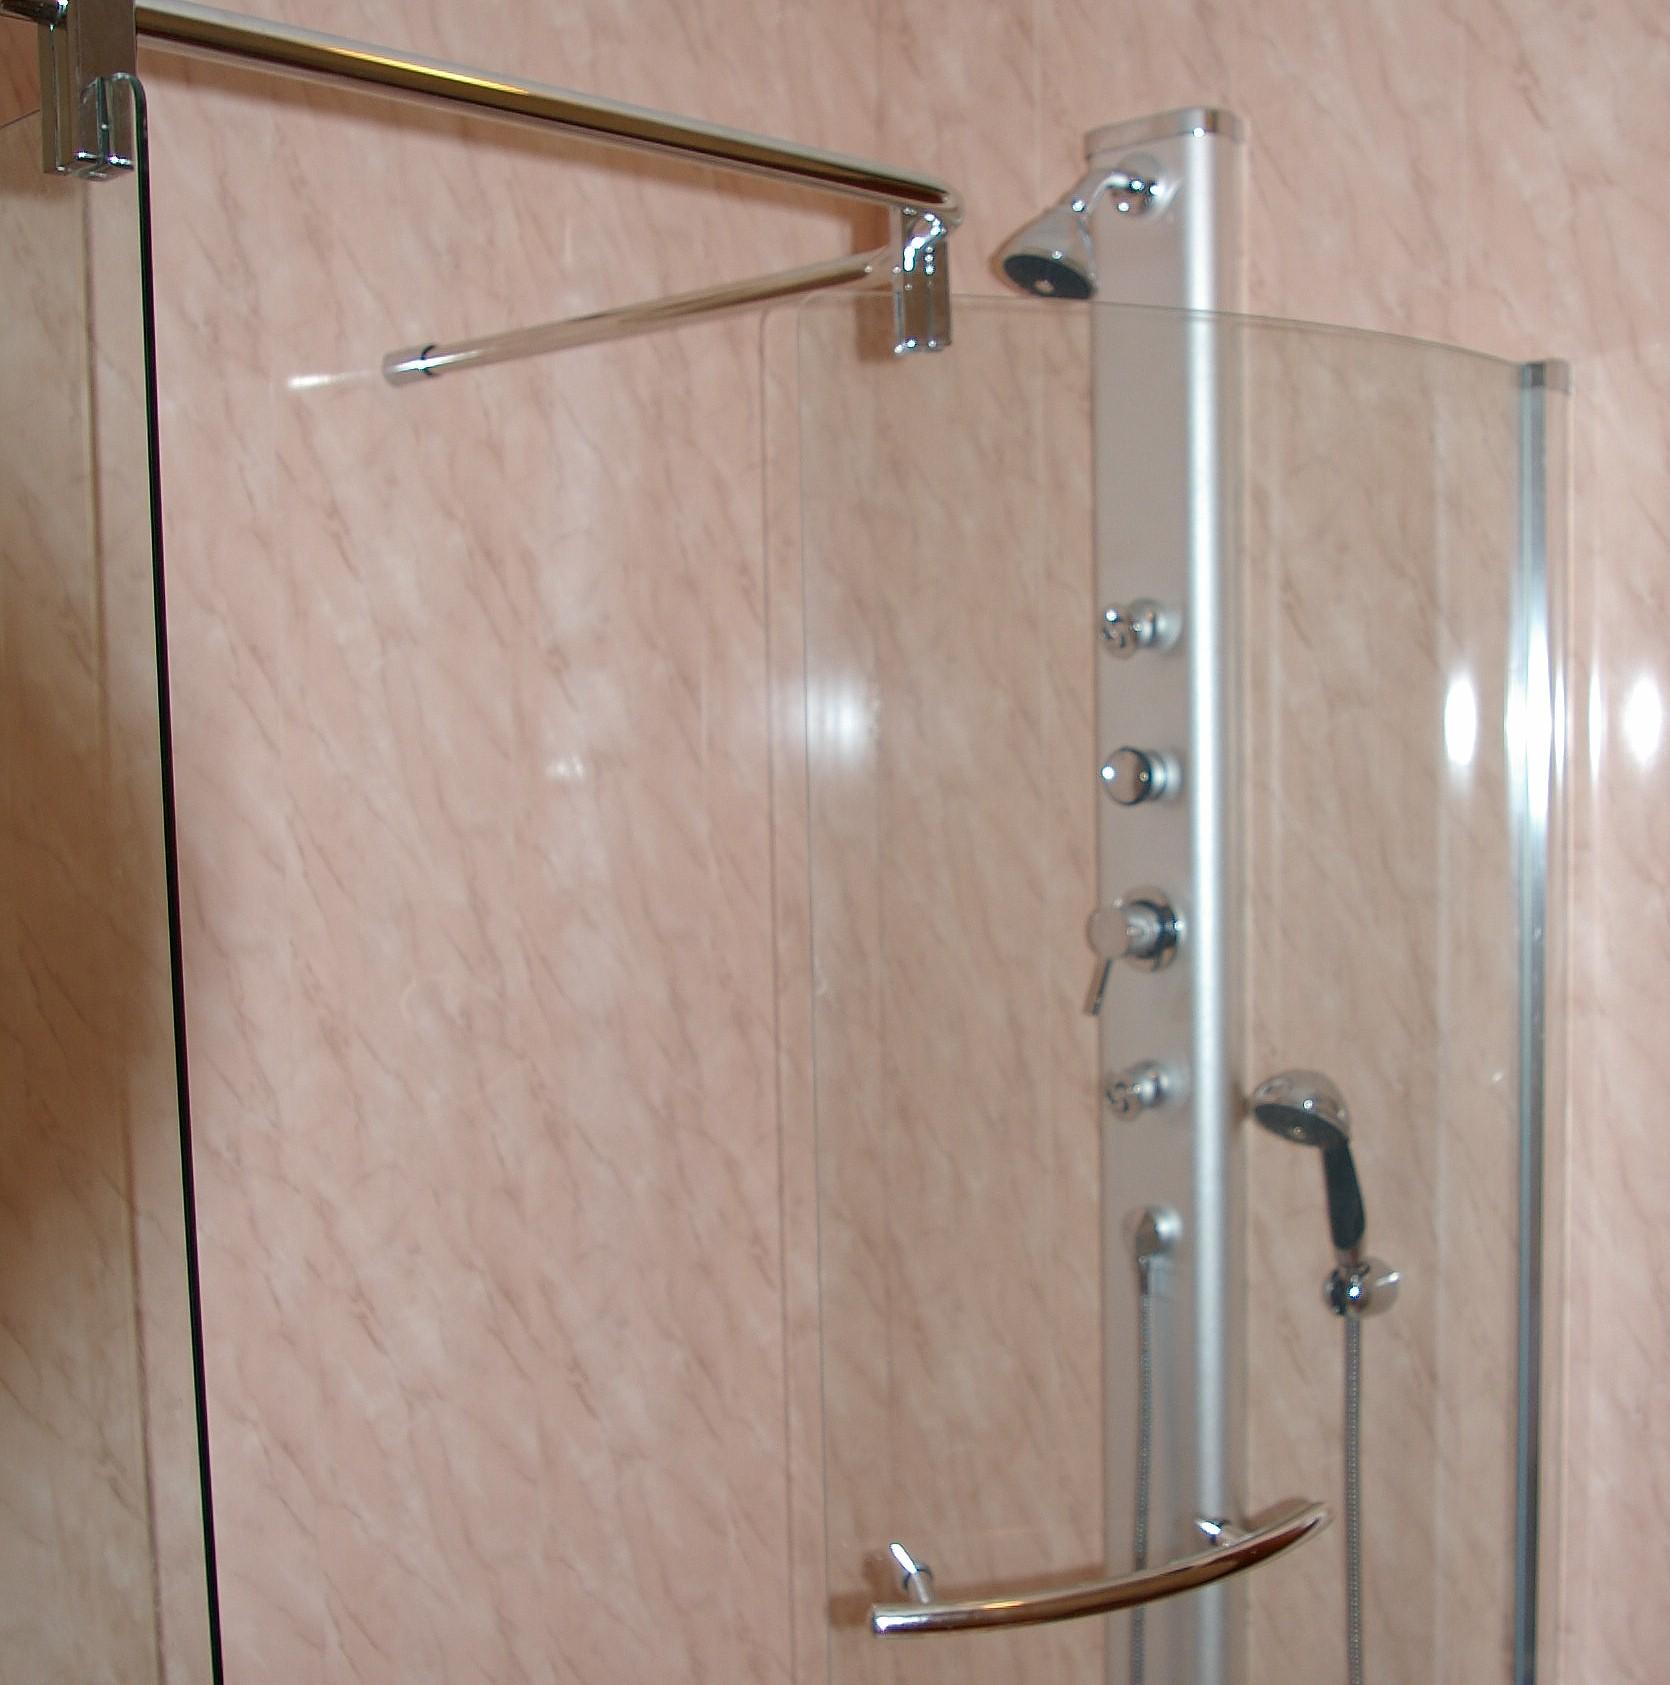 shower mixer - Bathroom Cladding In Wetrooms